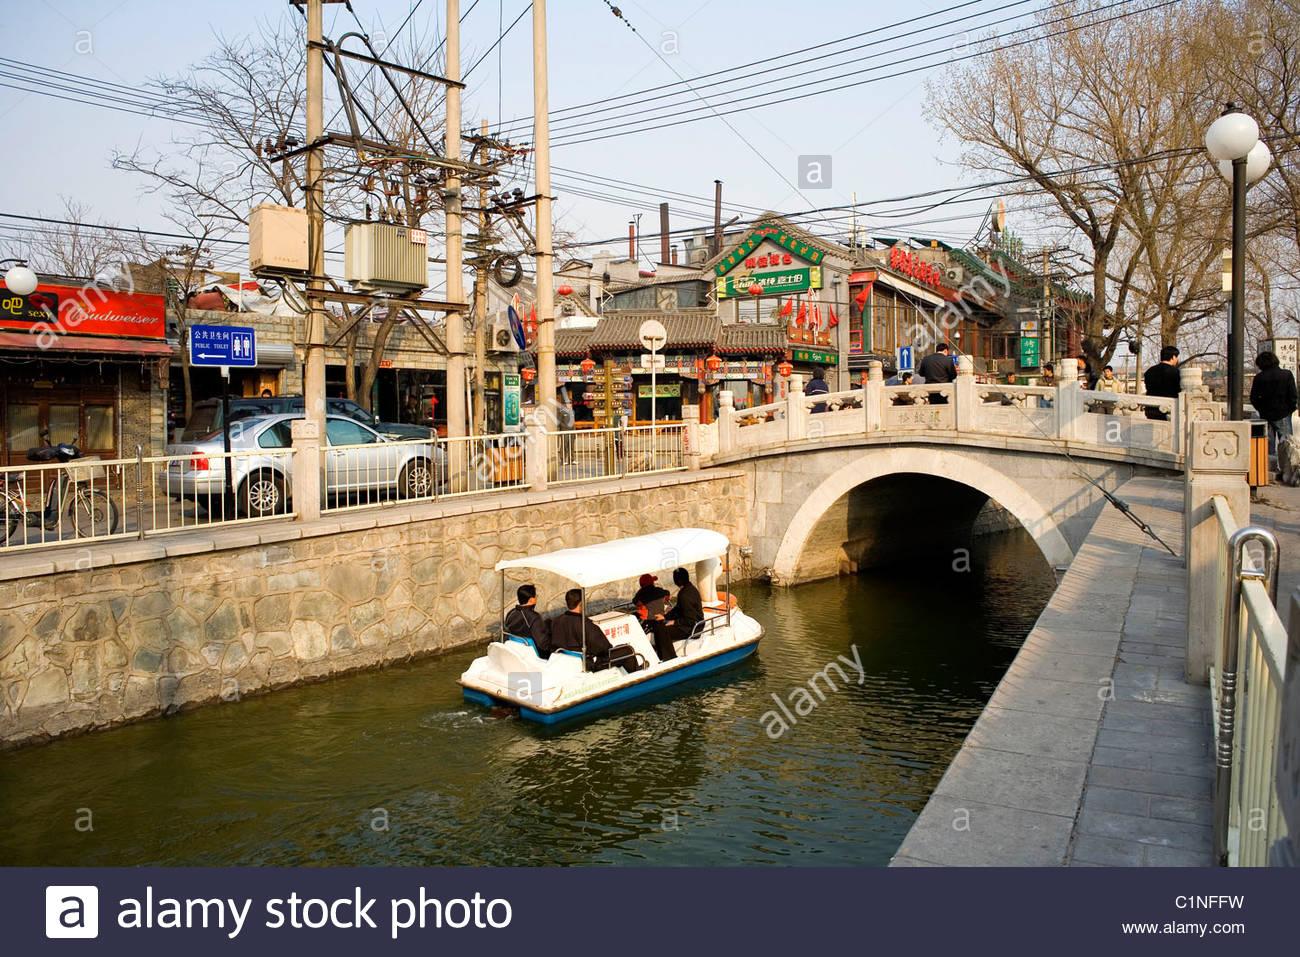 Beijing City, Shichahai, Hutong, Silver Ingot Bridge, Dongcheng District, China - Stock Image